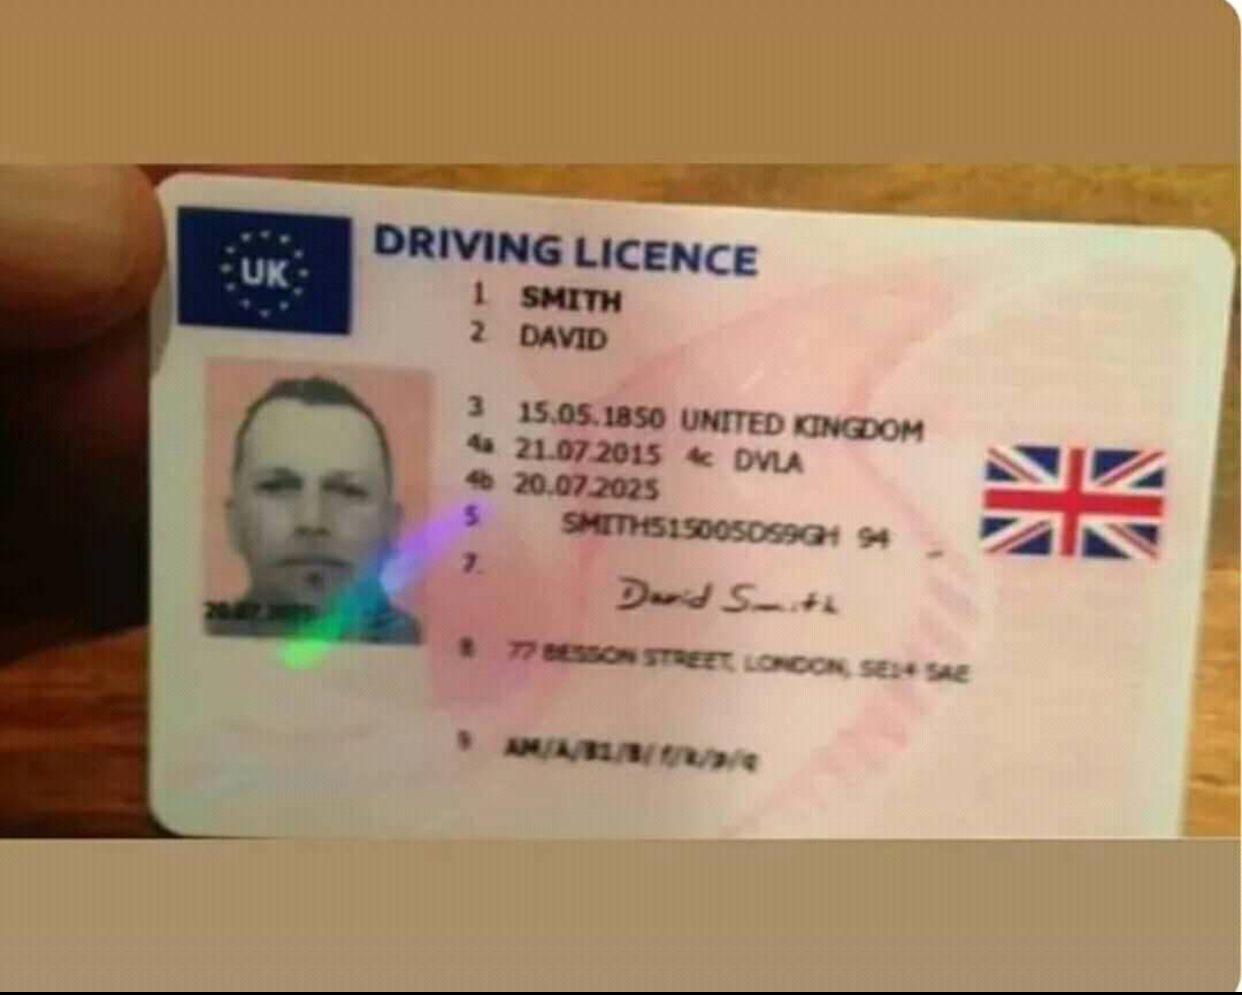 Buy real and fake uk drivers license online. We take